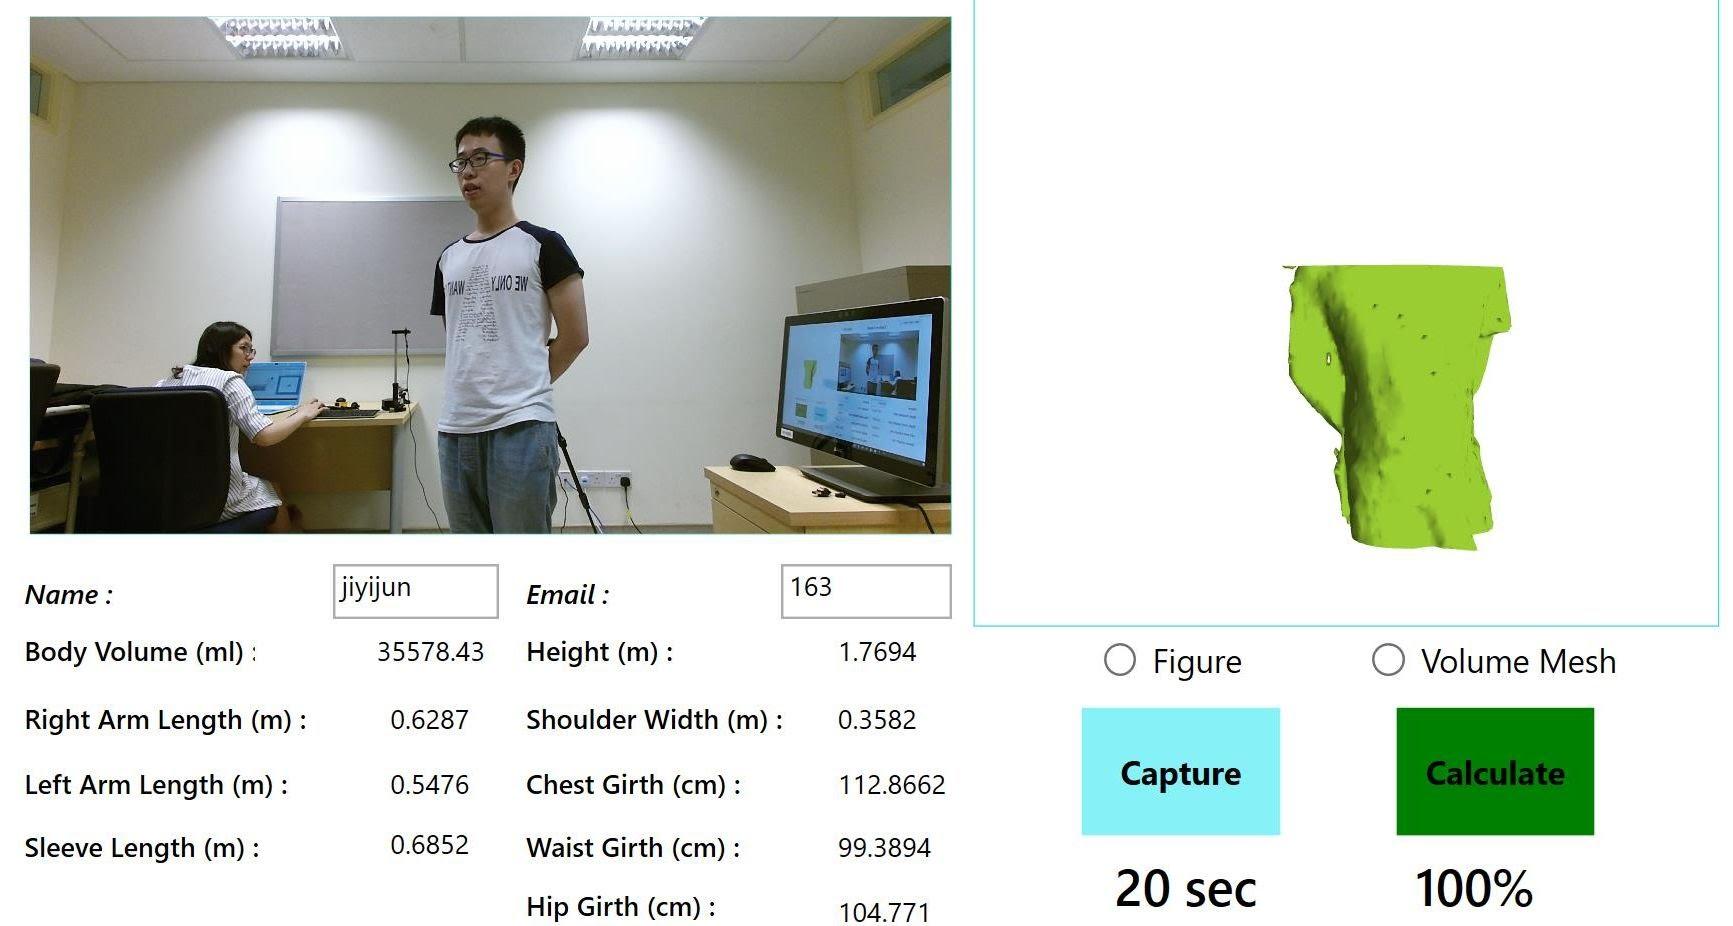 https://sites.google.com/a/opssg.org/opss/home/Kinect1.jpg